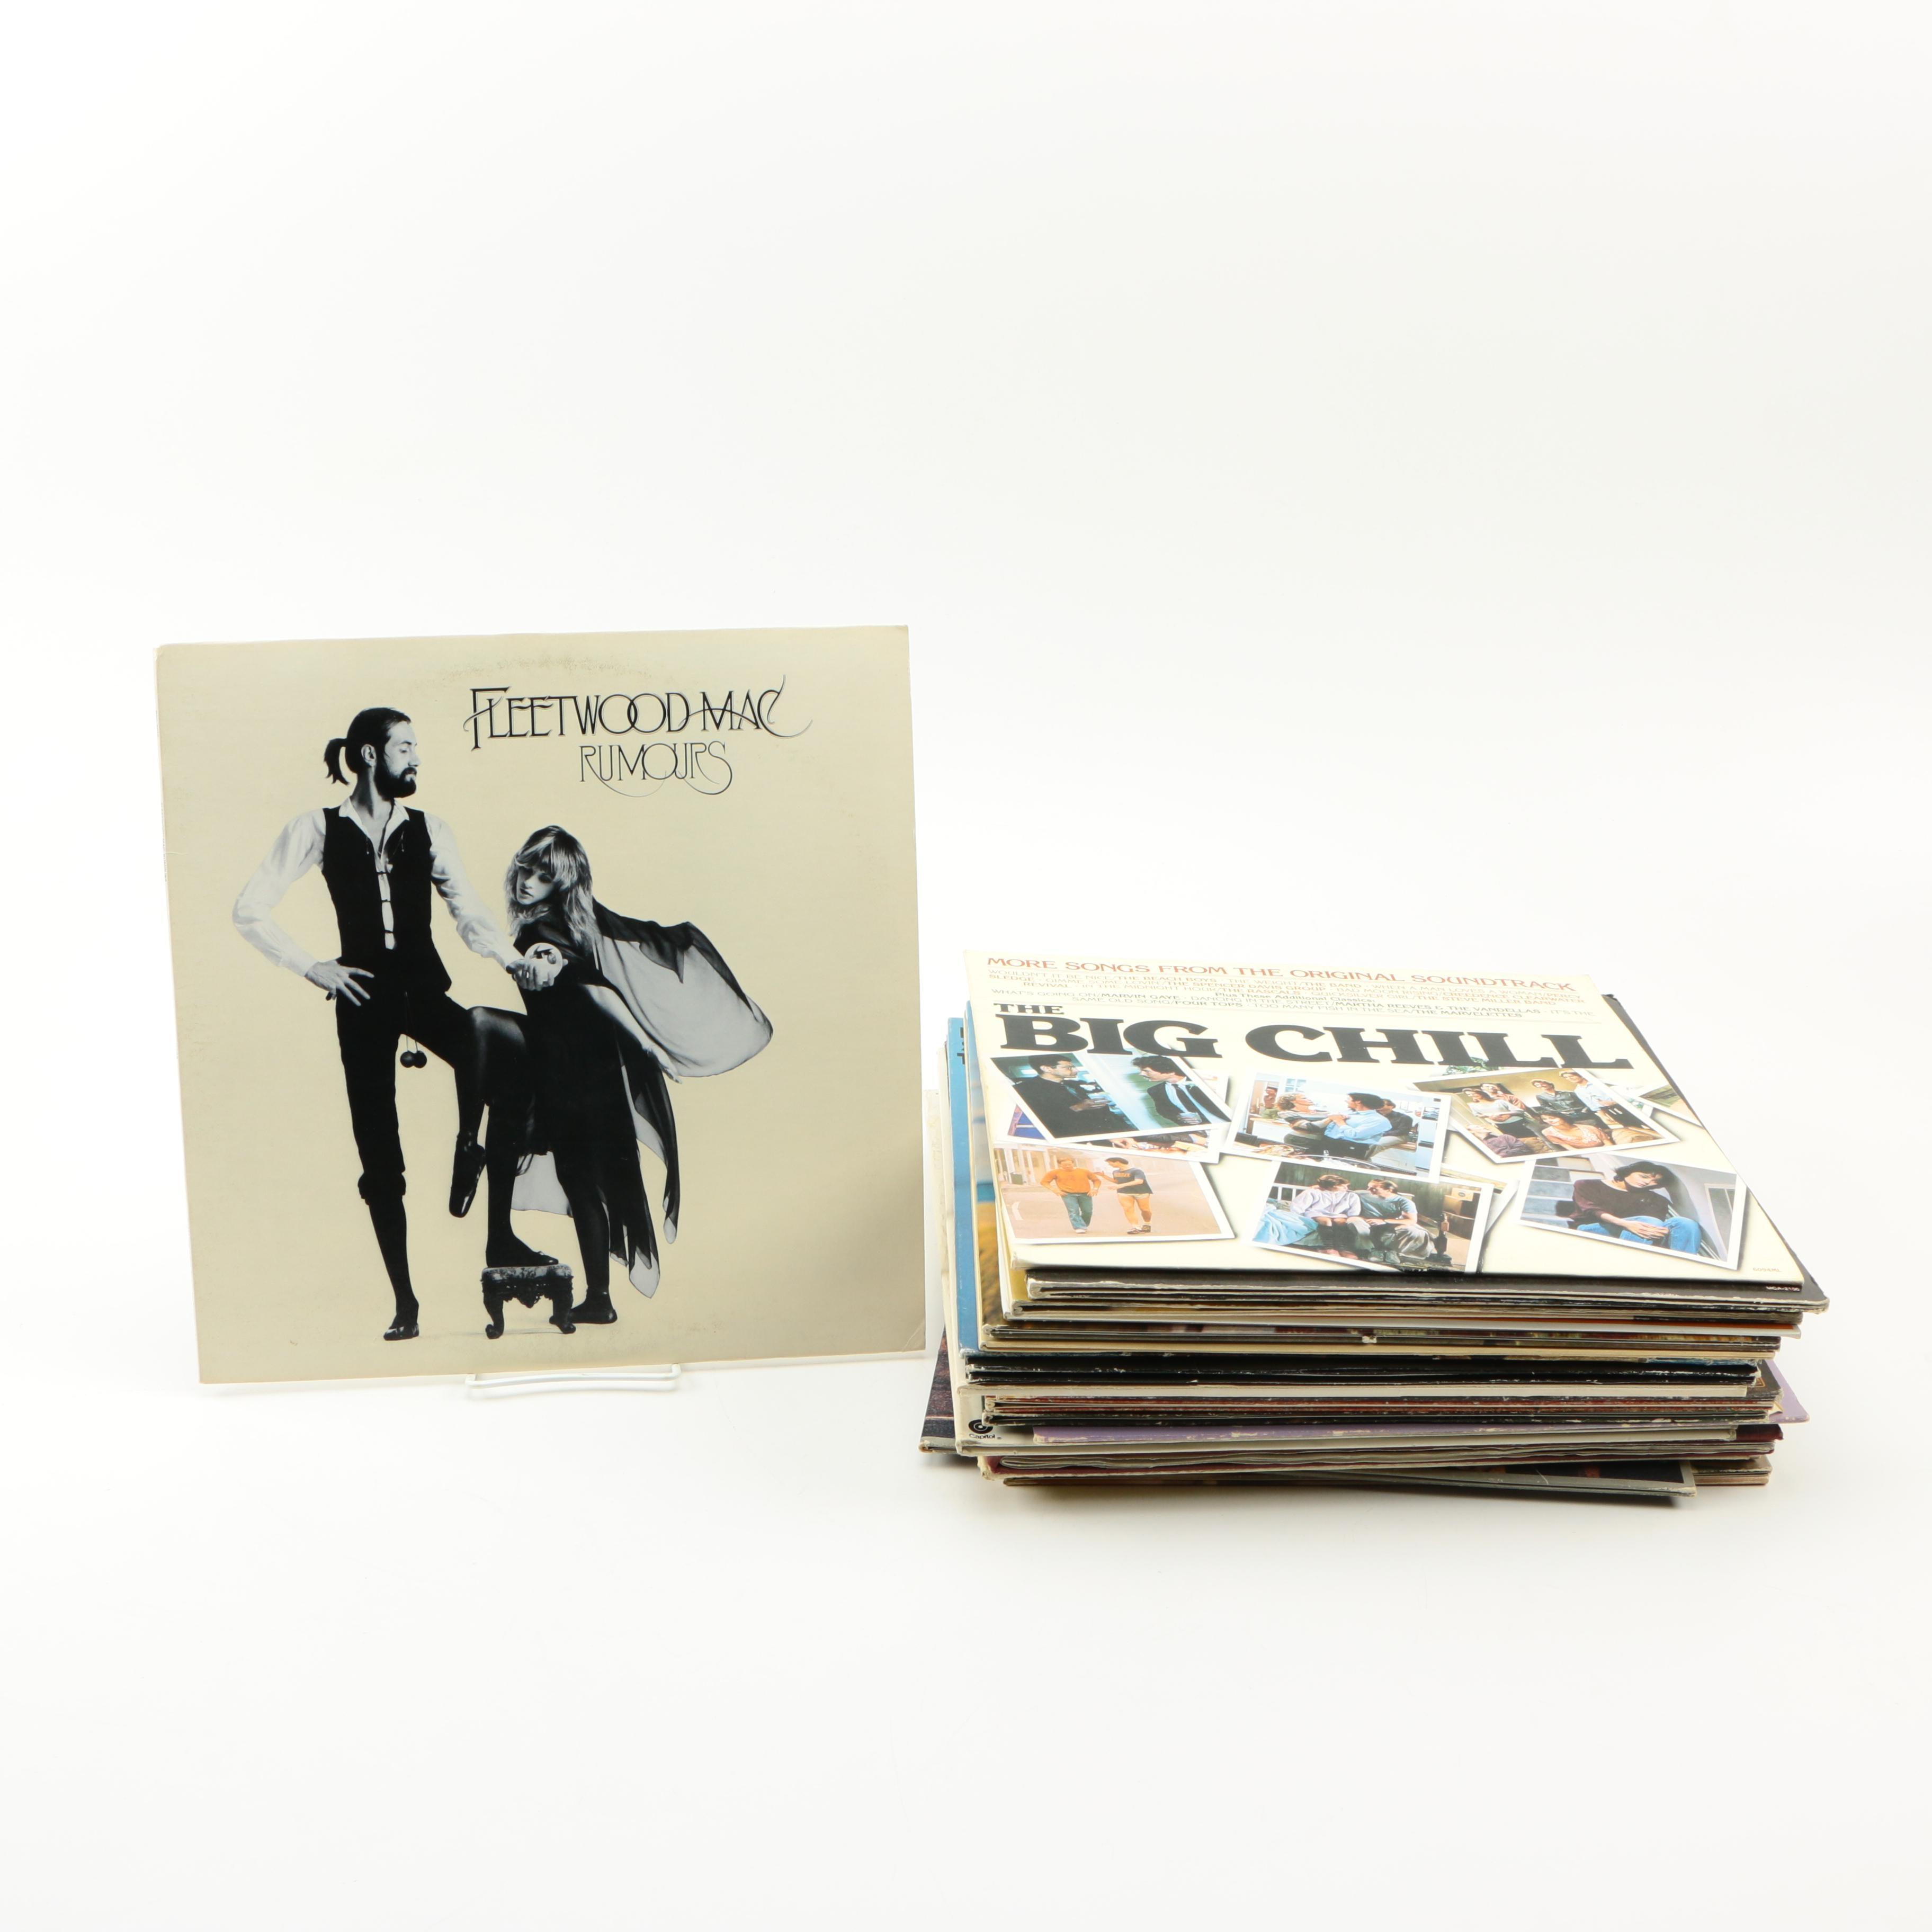 Fleetwood Mac, Paul Simon and Other Rock/Pop LPs